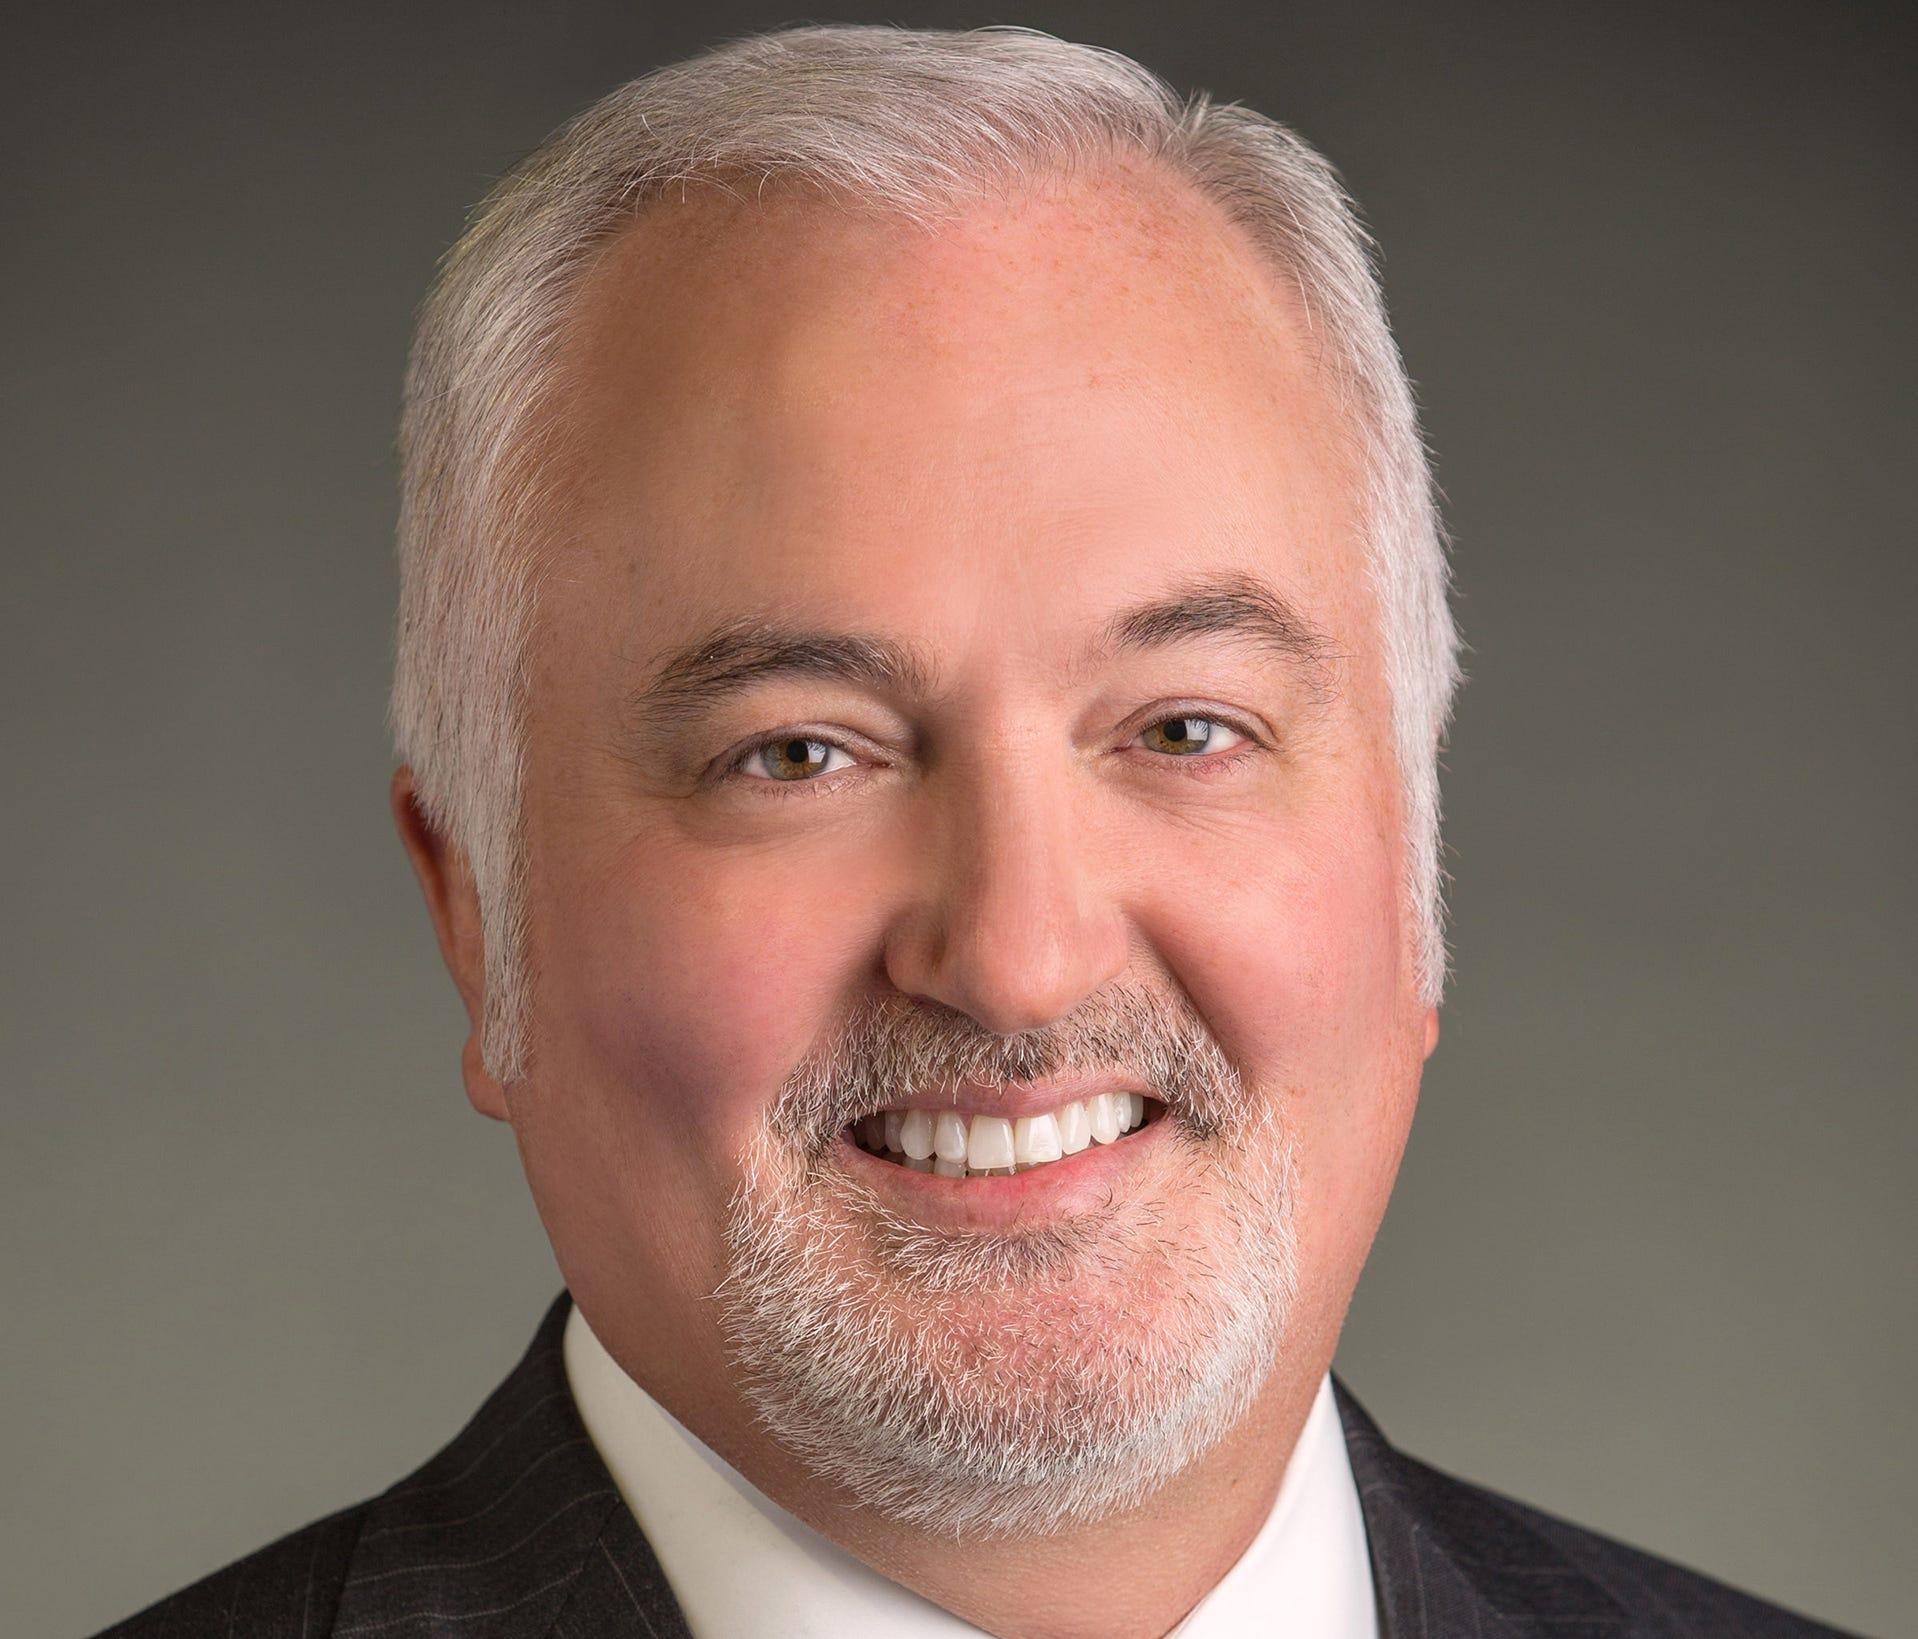 Steve Carlisle, GM senior vice president and president, Cadillac